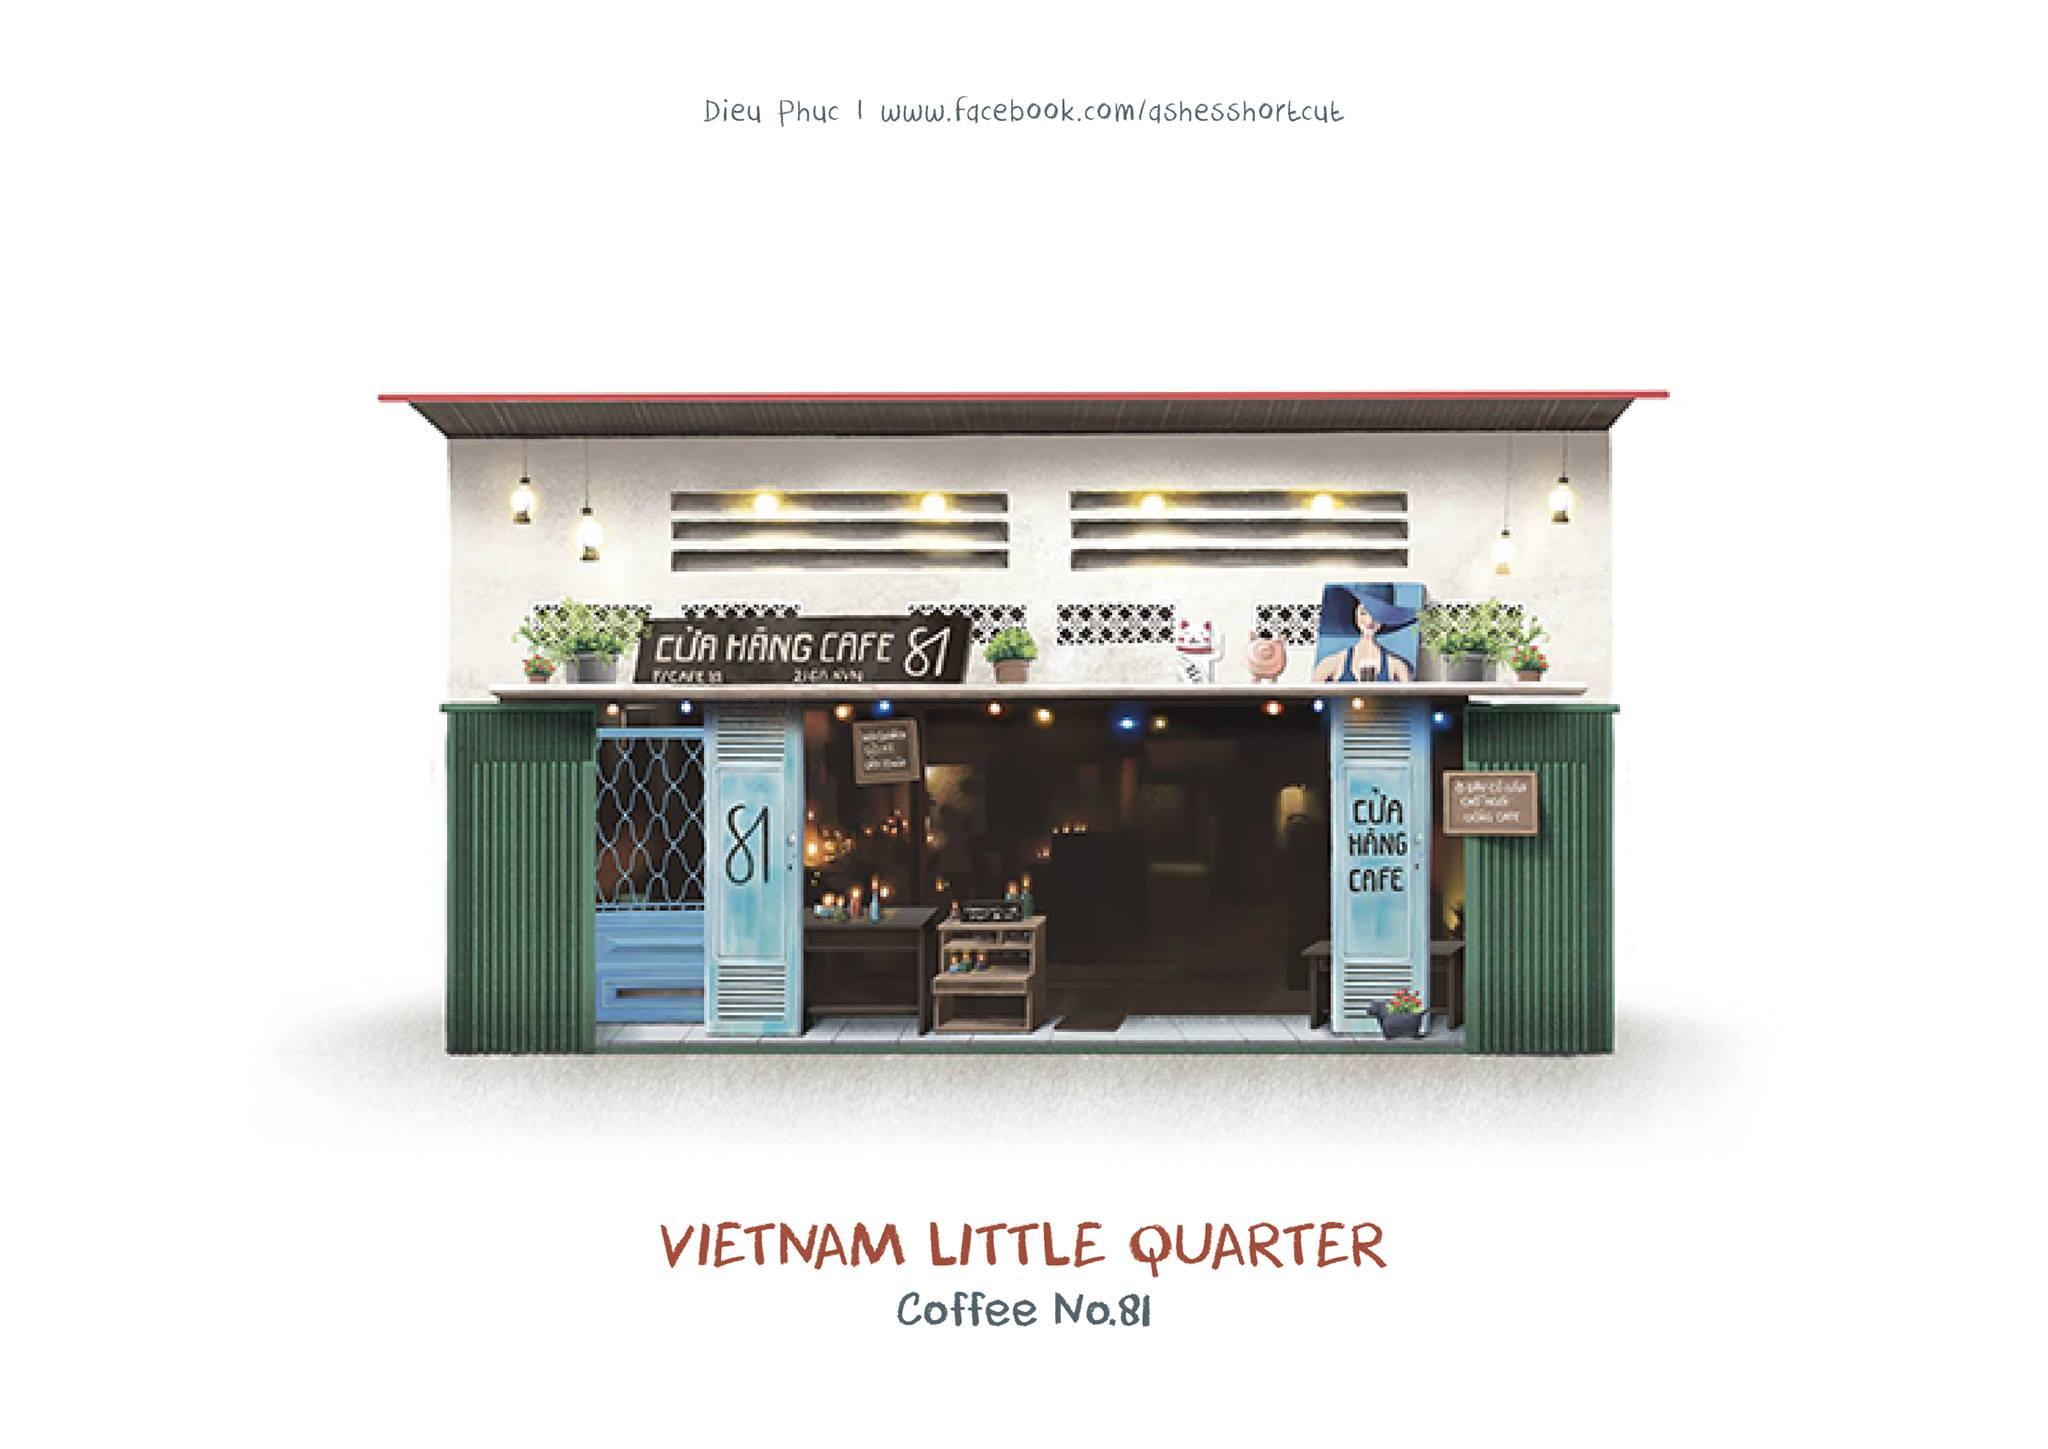 RGB_VietnamLittleQuarter_06